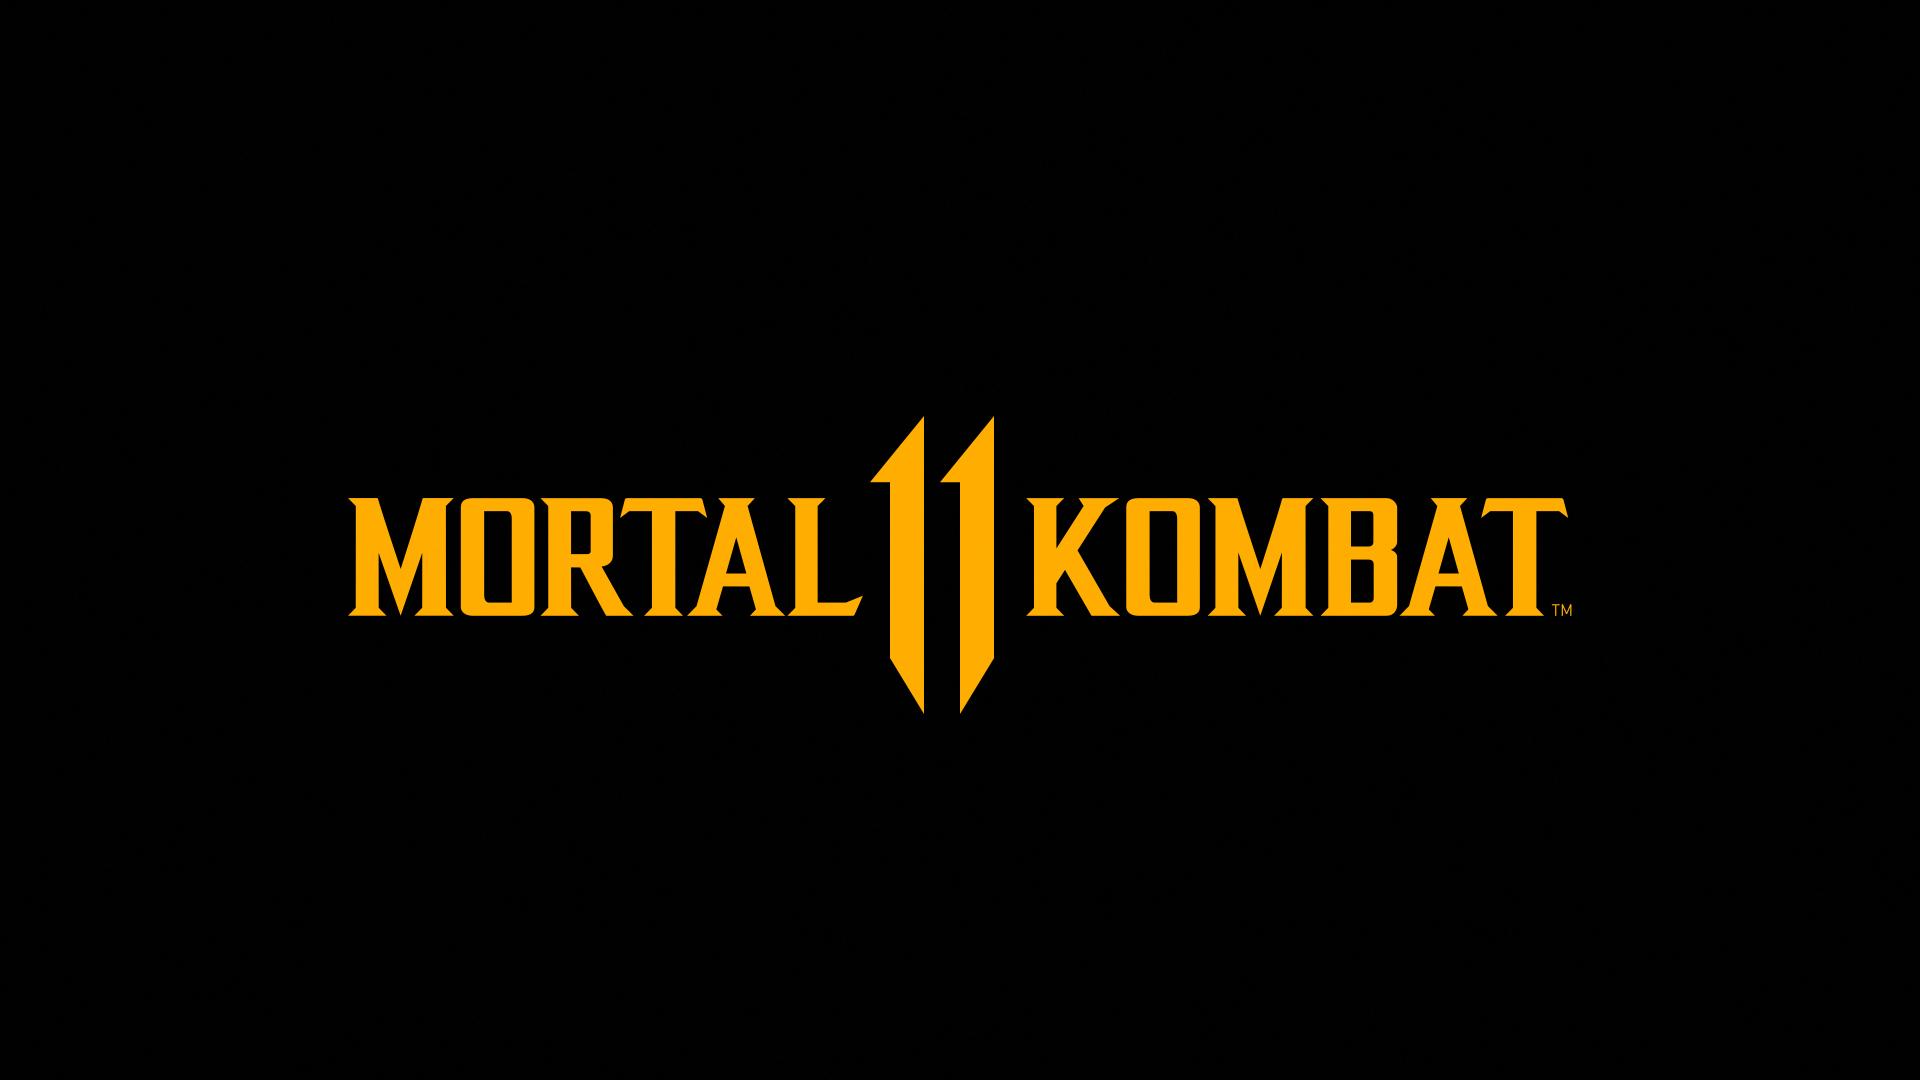 Wallpaper Mortal Kombat Mortal Kombat 11 Scorpion Character